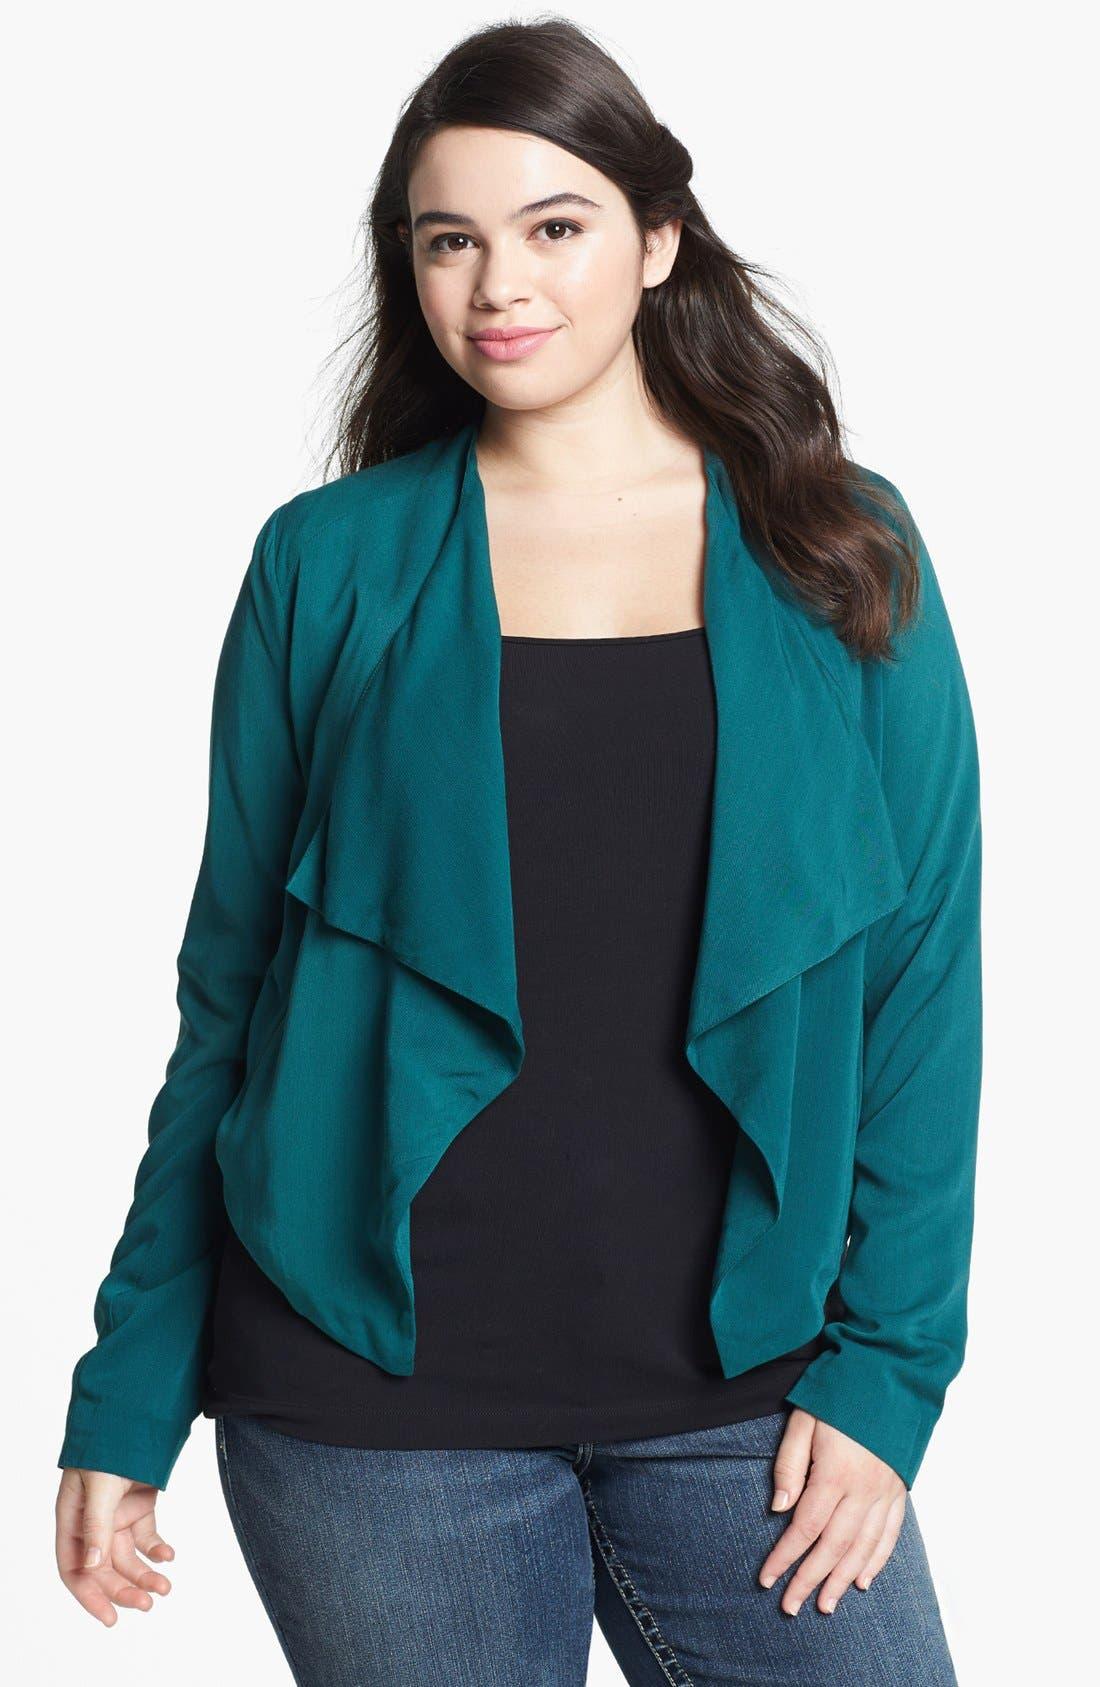 Alternate Image 1 Selected - BB Dakota 'Camden' Jacket (Plus Size)